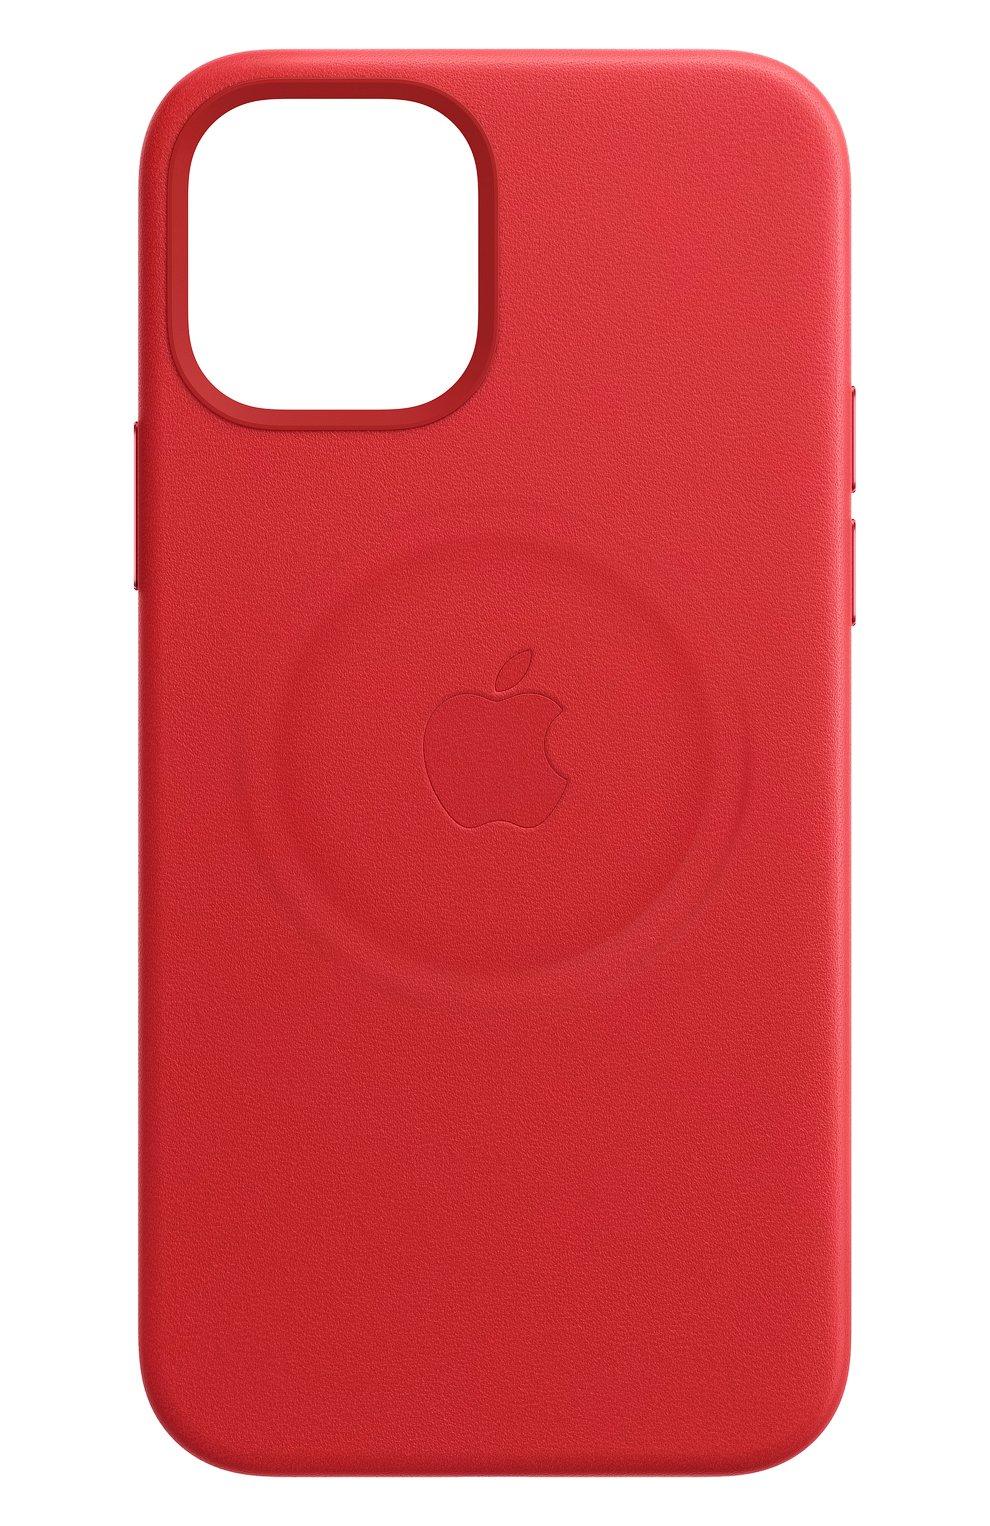 Чехол magsafe для iphone 12 pro max APPLE  (product)red цвета, арт. MHKJ3ZE/A | Фото 1